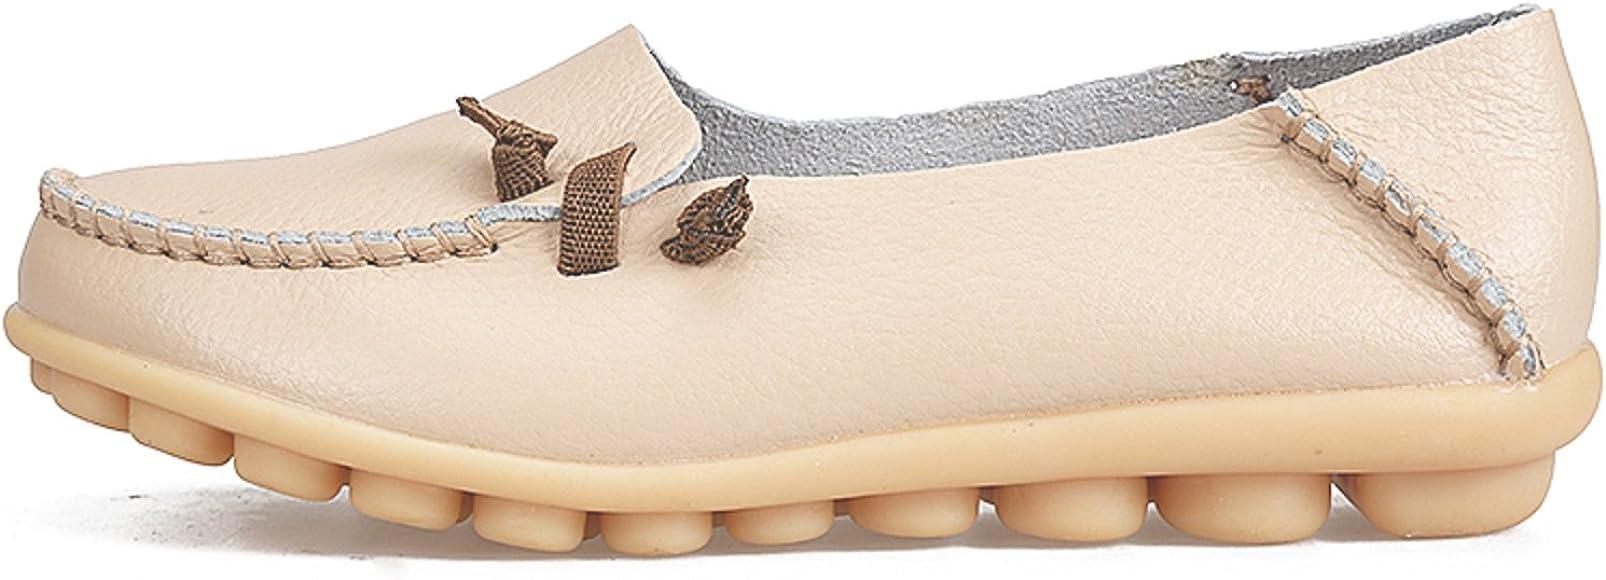 Comfort Walking Cute Flat Loafer